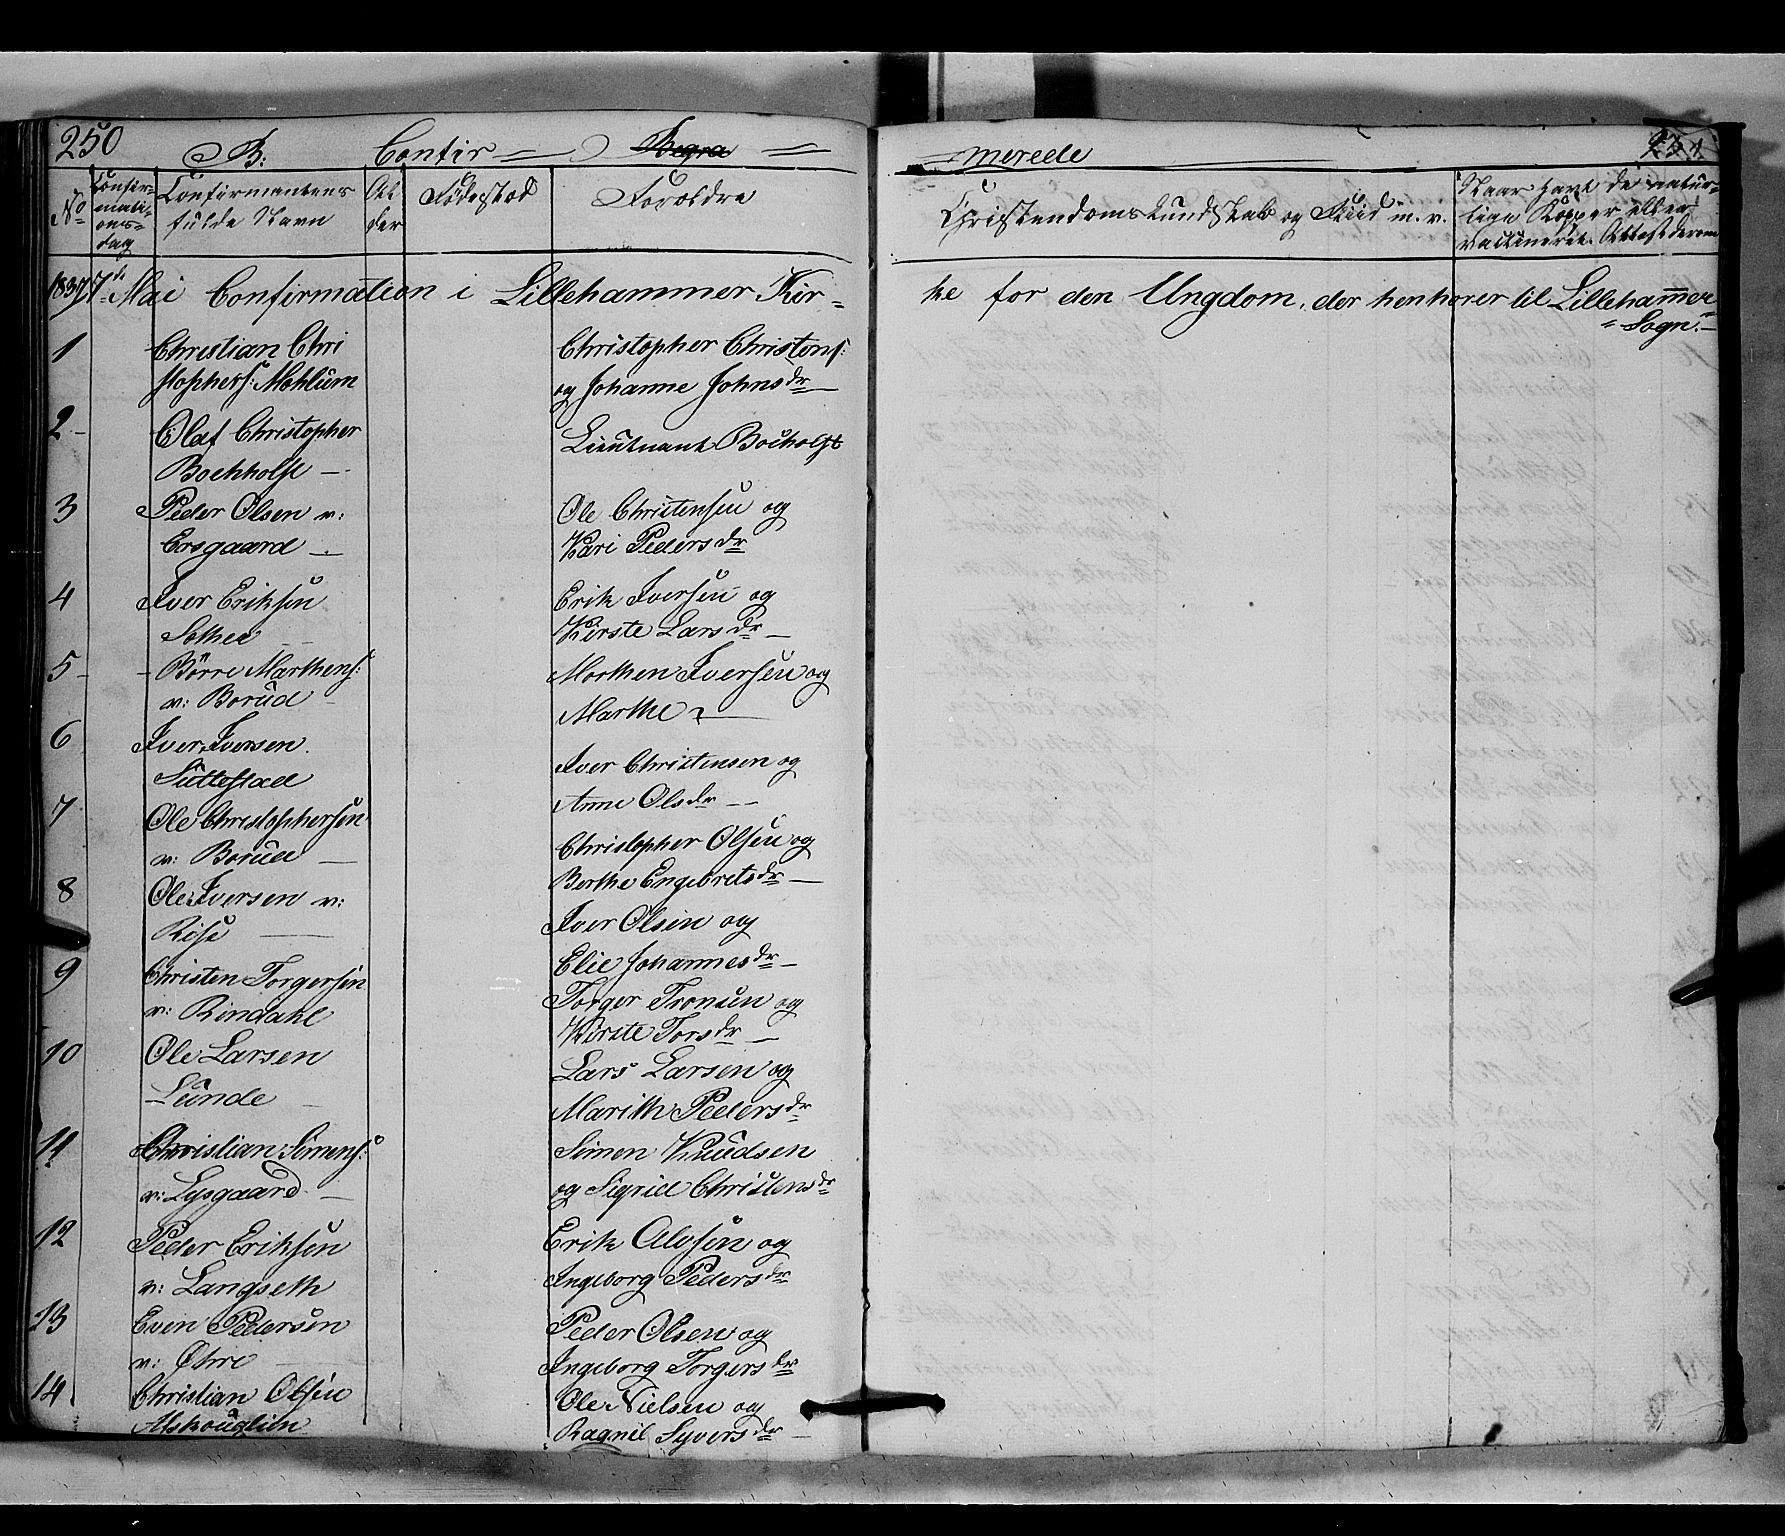 SAH, Fåberg prestekontor, H/Ha/Hab/L0006: Parish register (copy) no. 6, 1837-1855, p. 250-251